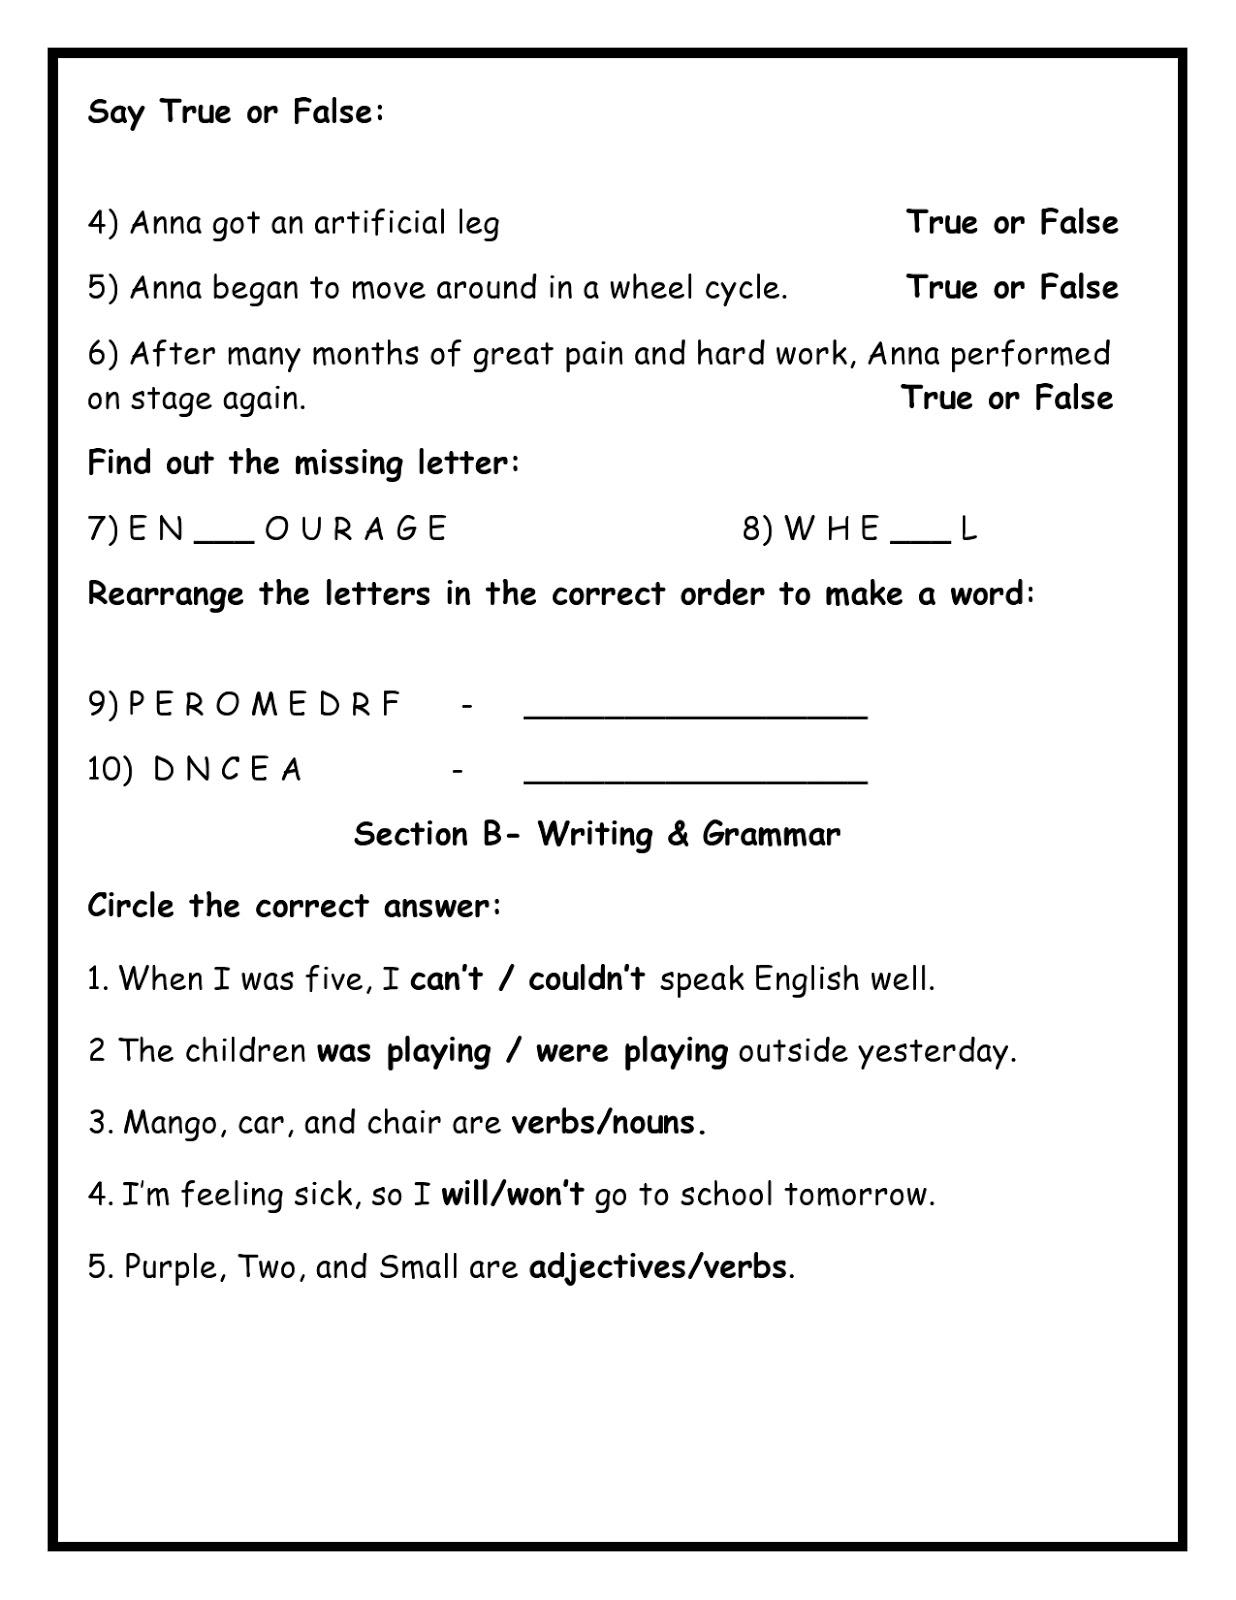 Birla World School Oman Homework For Grade 3 As On 23 12